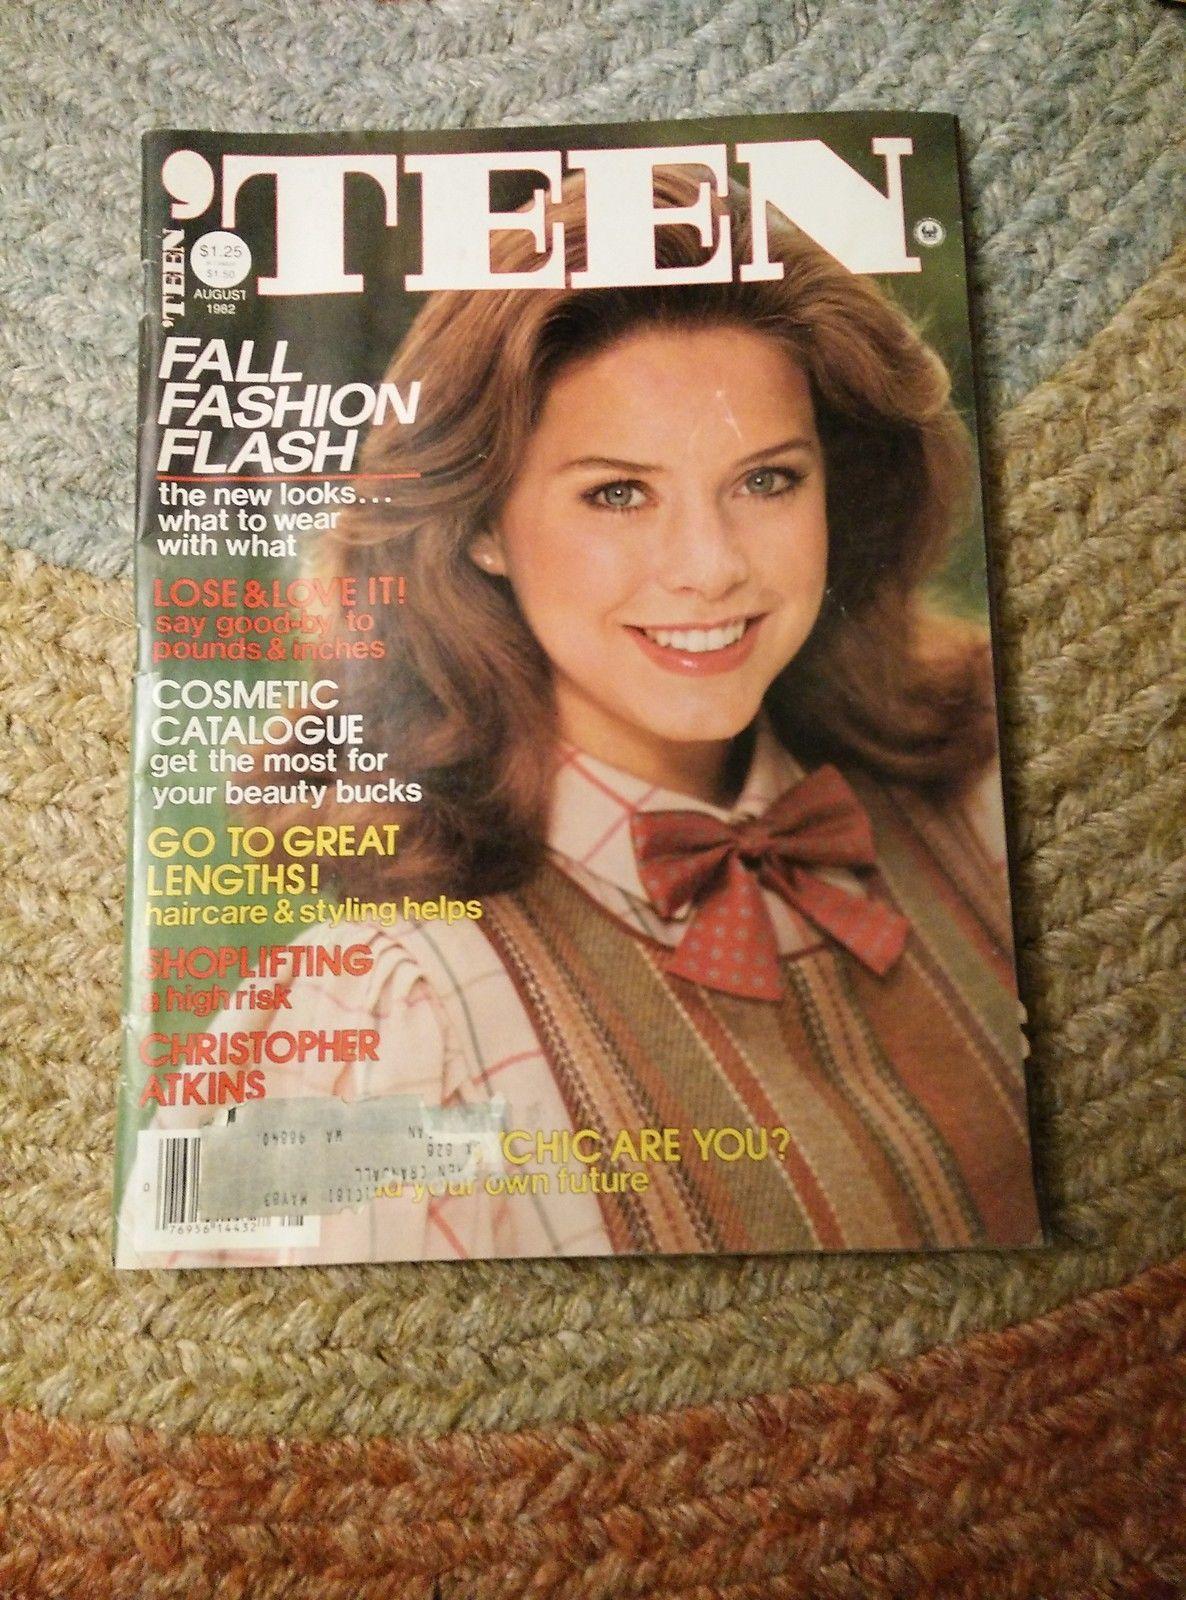 former-teen-fashin-magazine-girl-very-sensitive-pussy